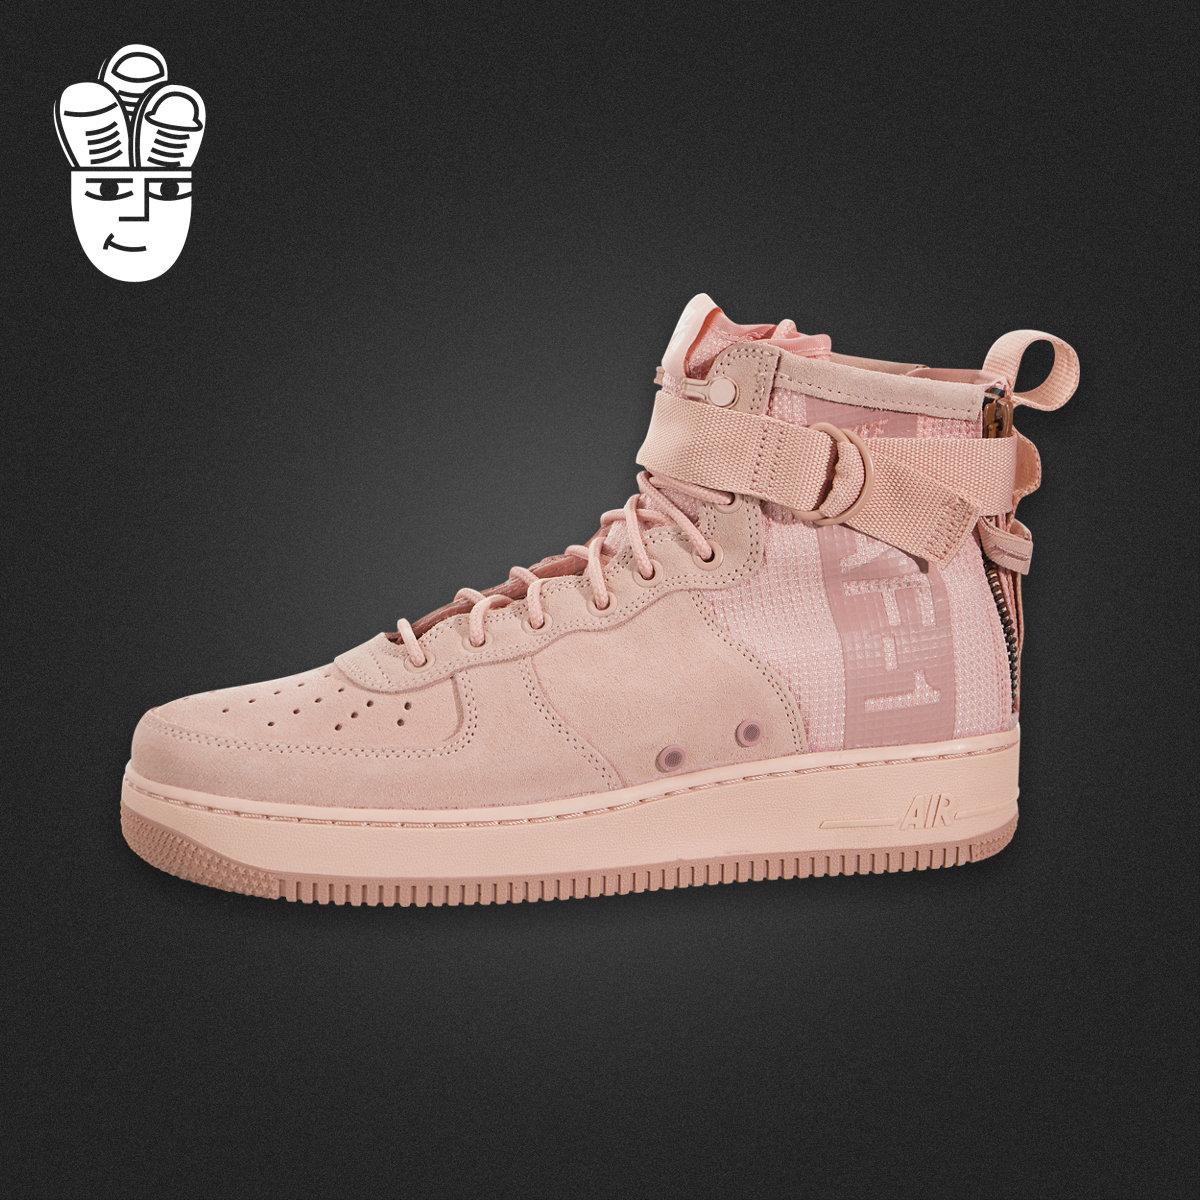 Nike SF Air Force 1 Mid 耐克空军一号篮球鞋 中帮运动休闲鞋